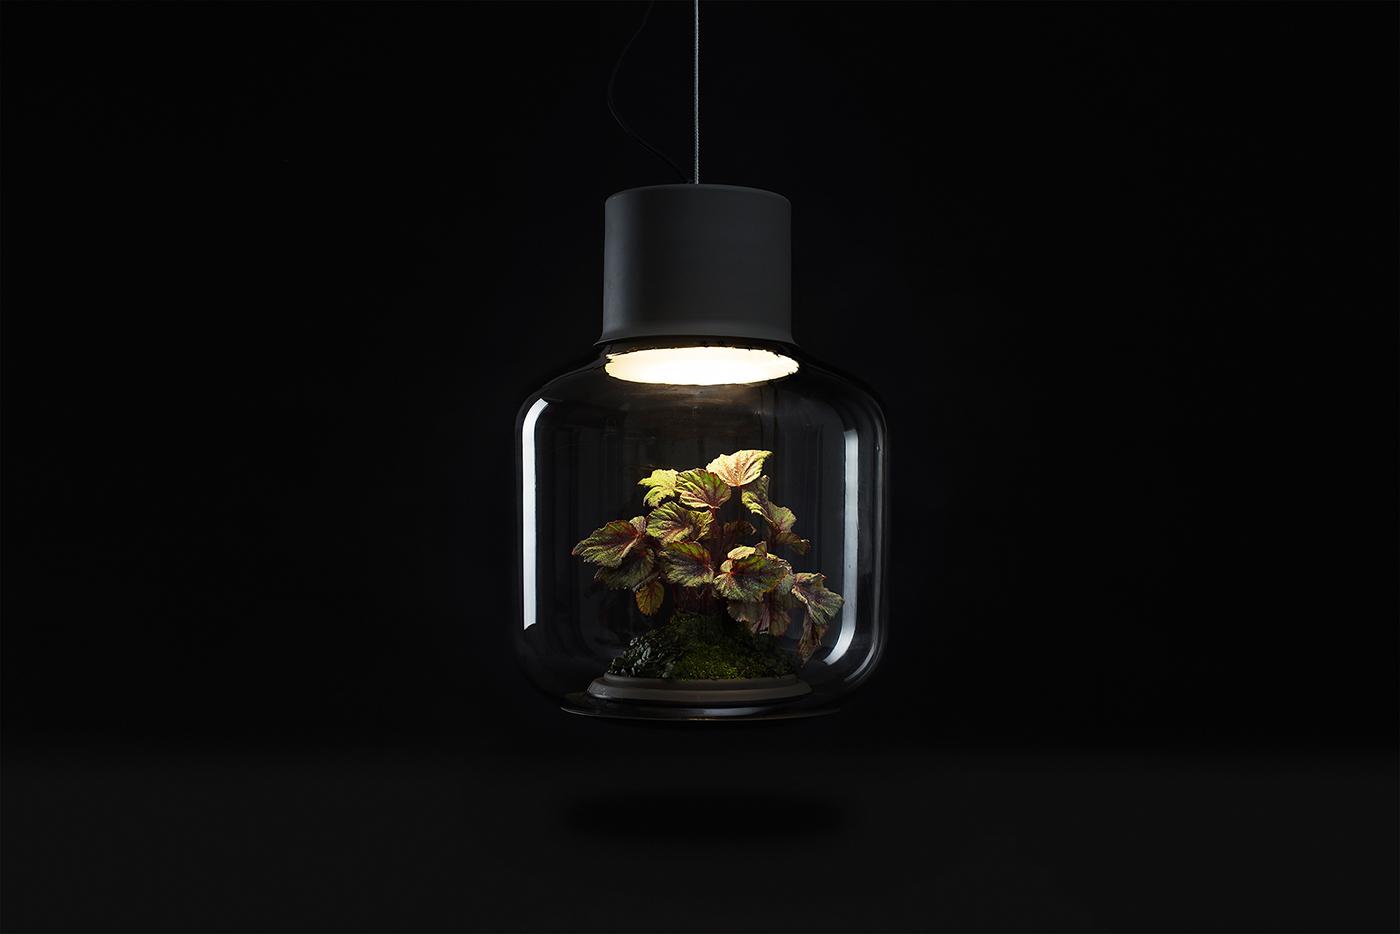 mygdal_lamp_05_web_ErwinBlock-Photography